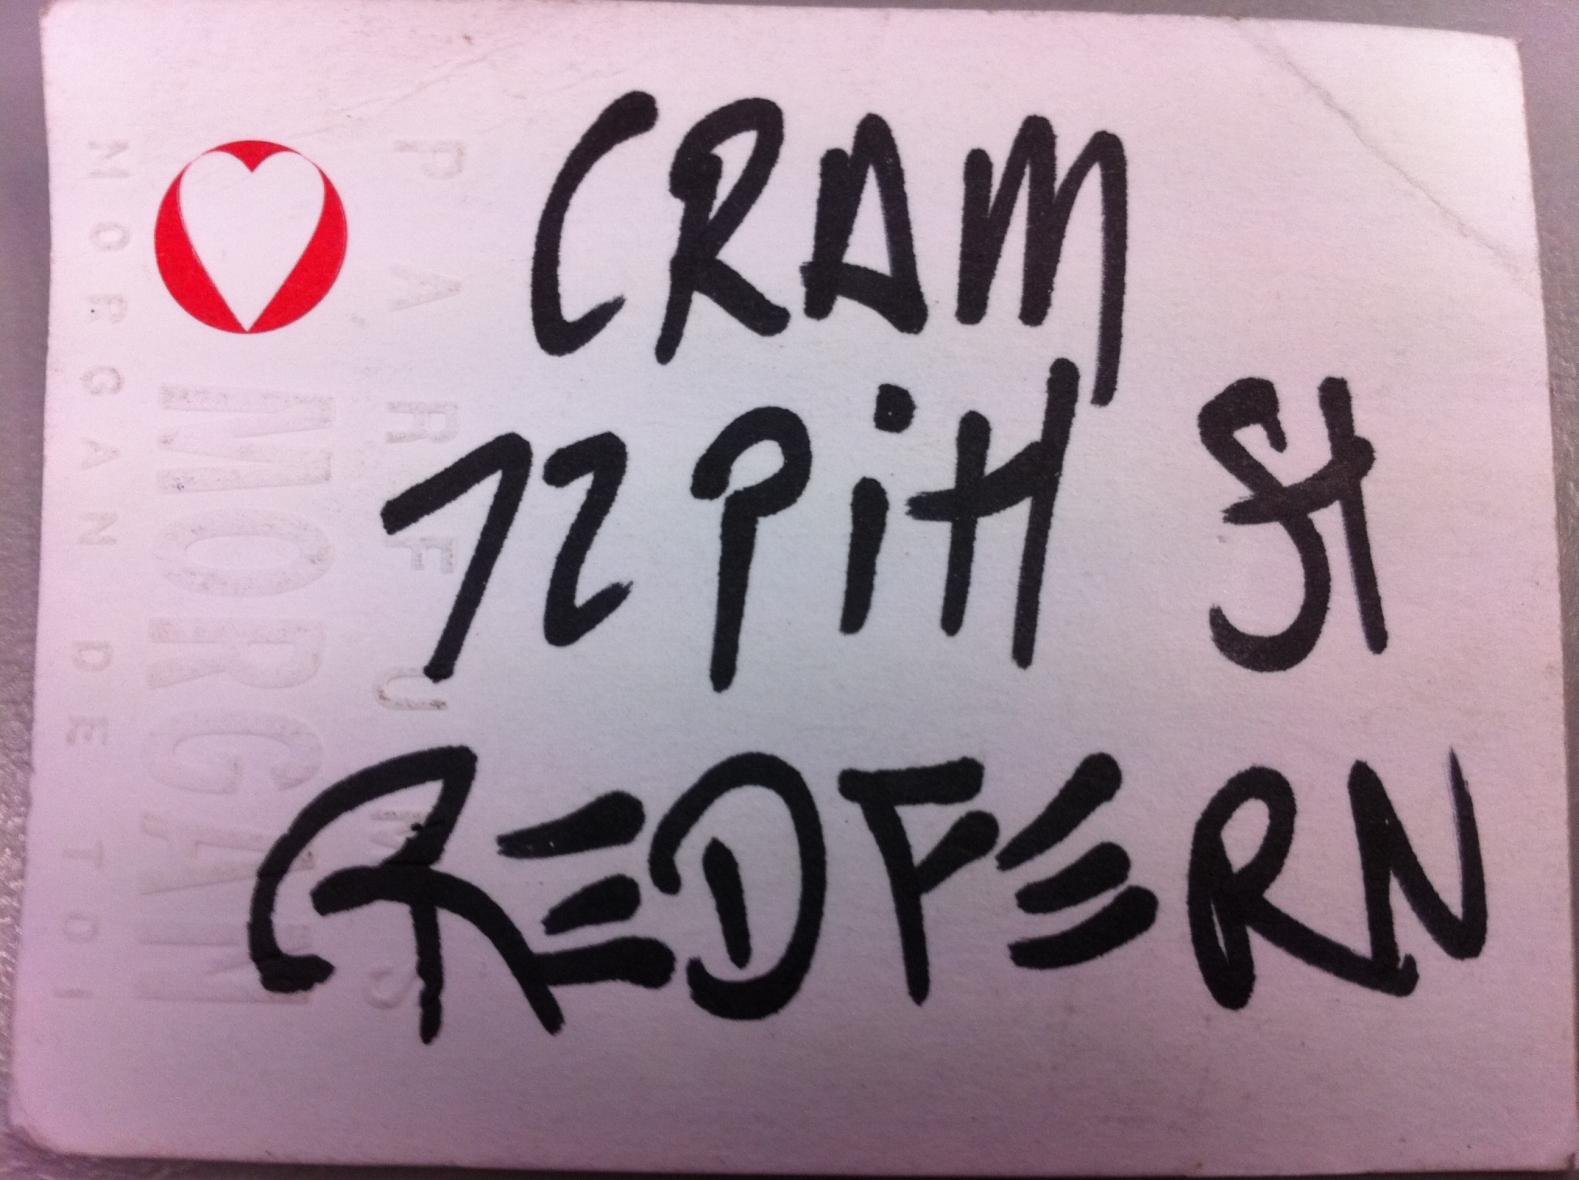 Cram - 72 Pitt Street Redfern